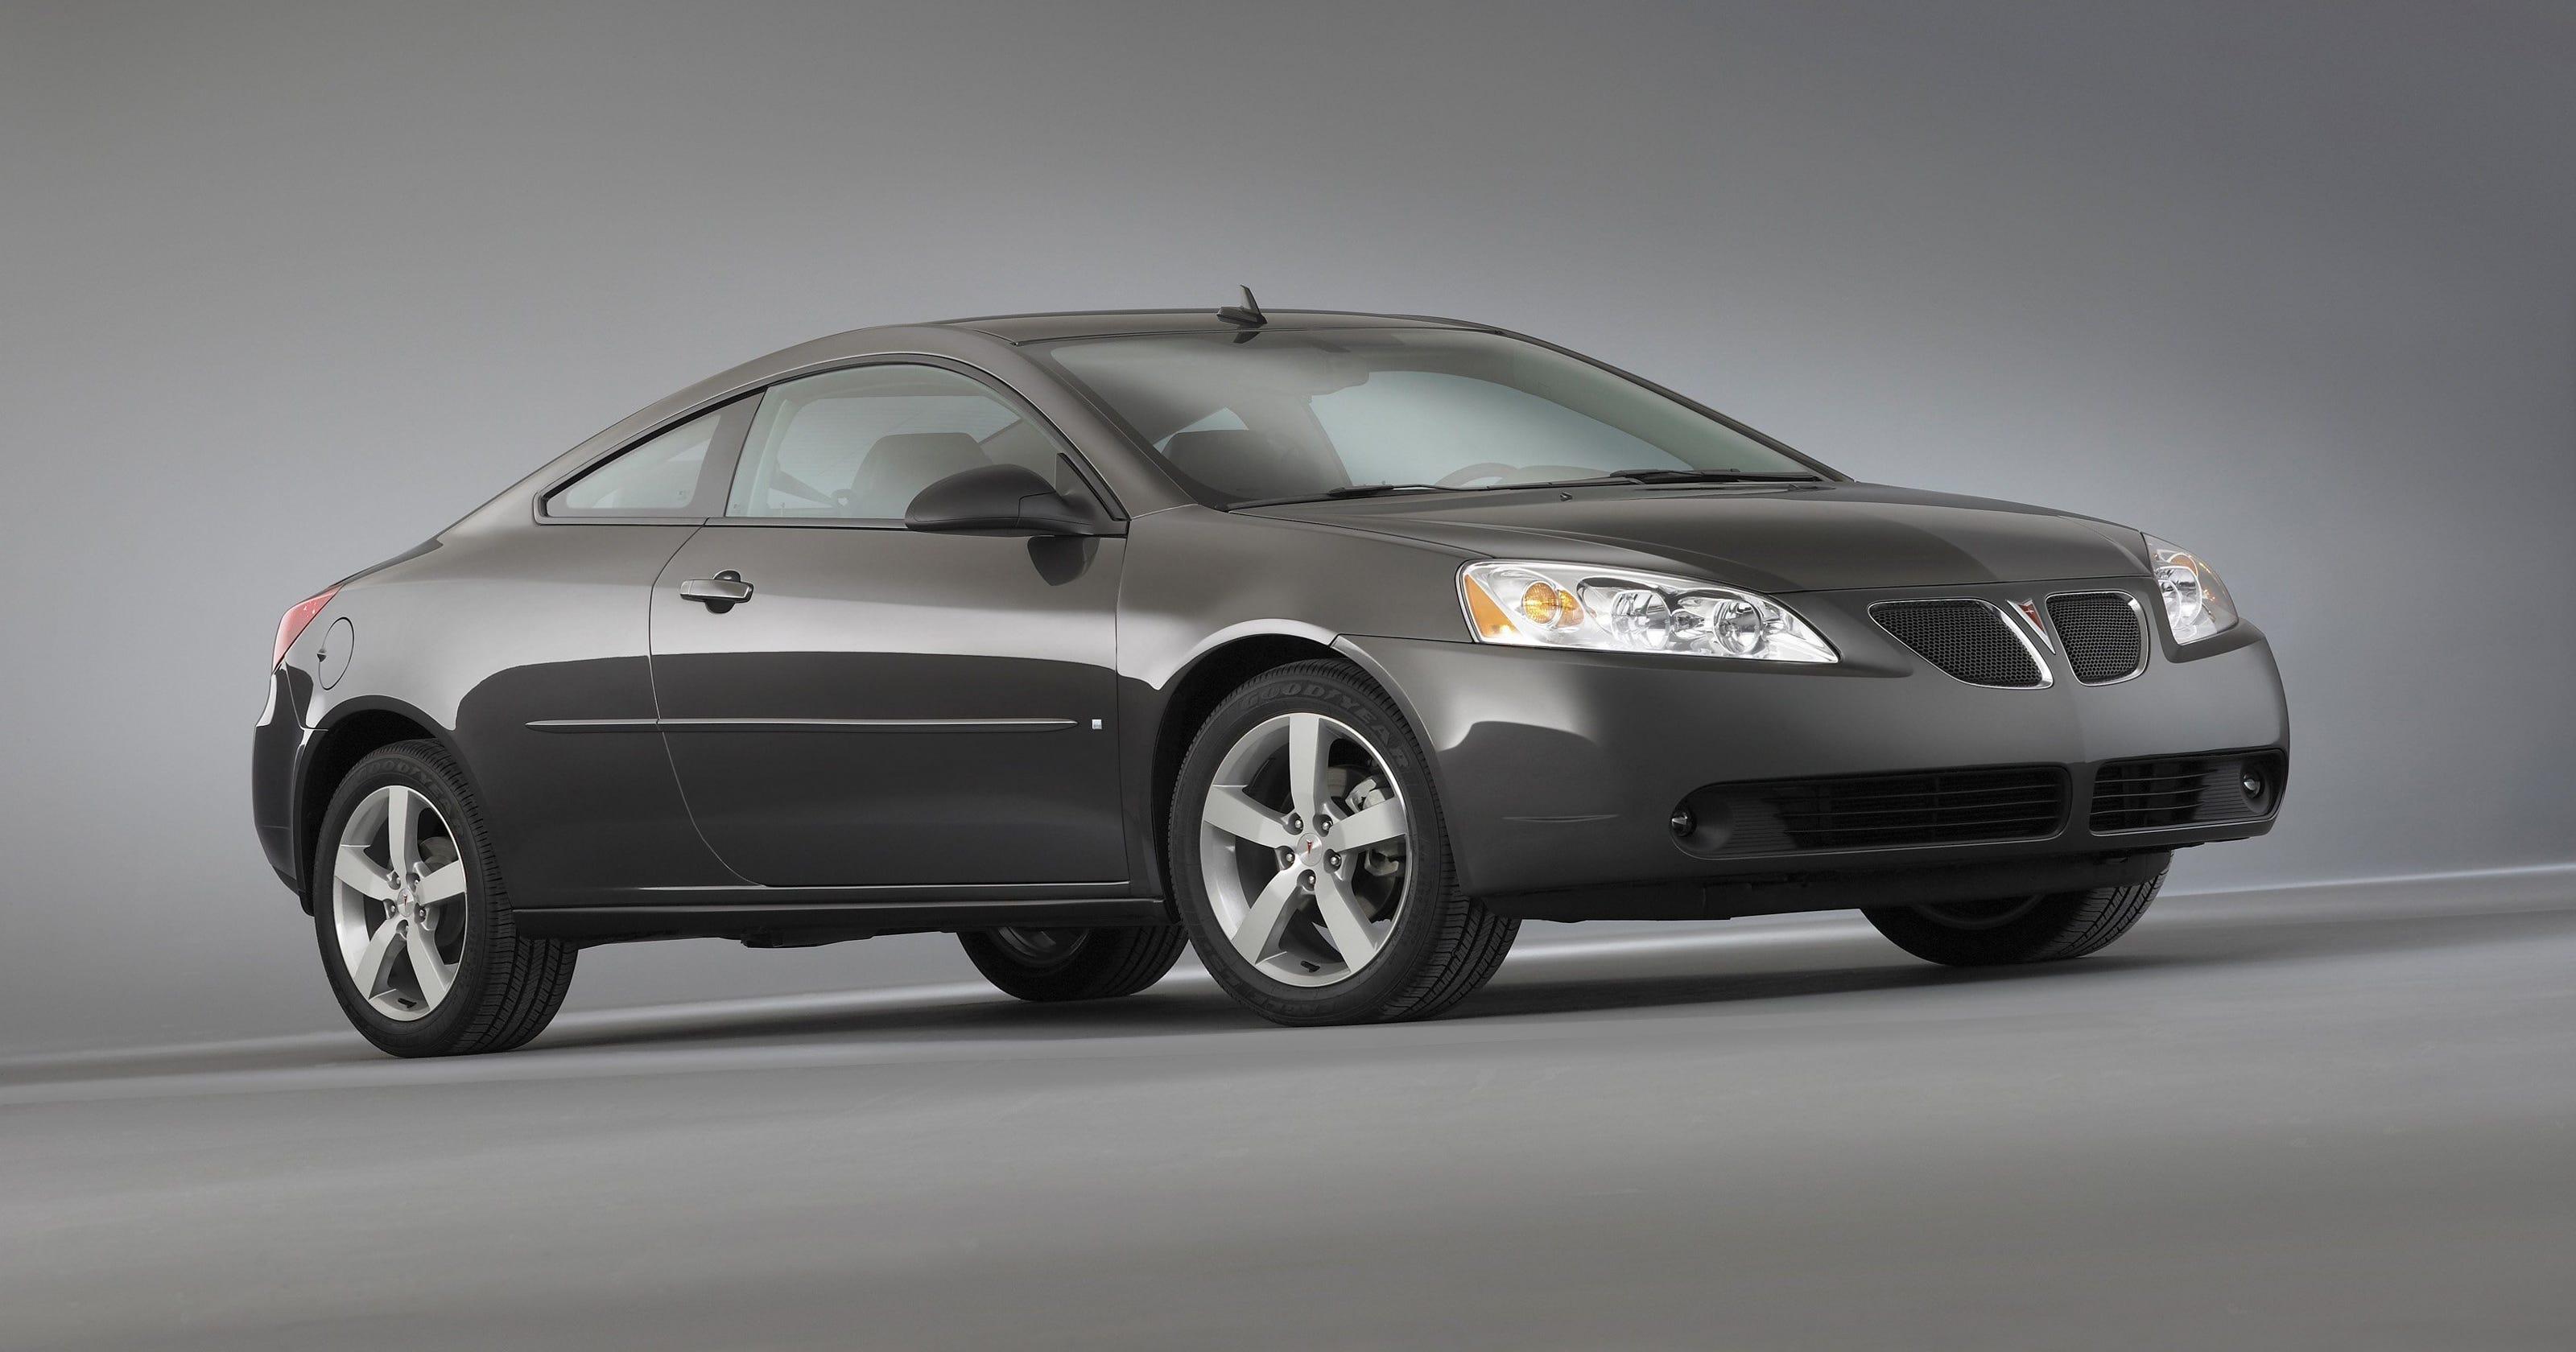 GM recalls 81K Malibus, Pontiacs for power steering problem